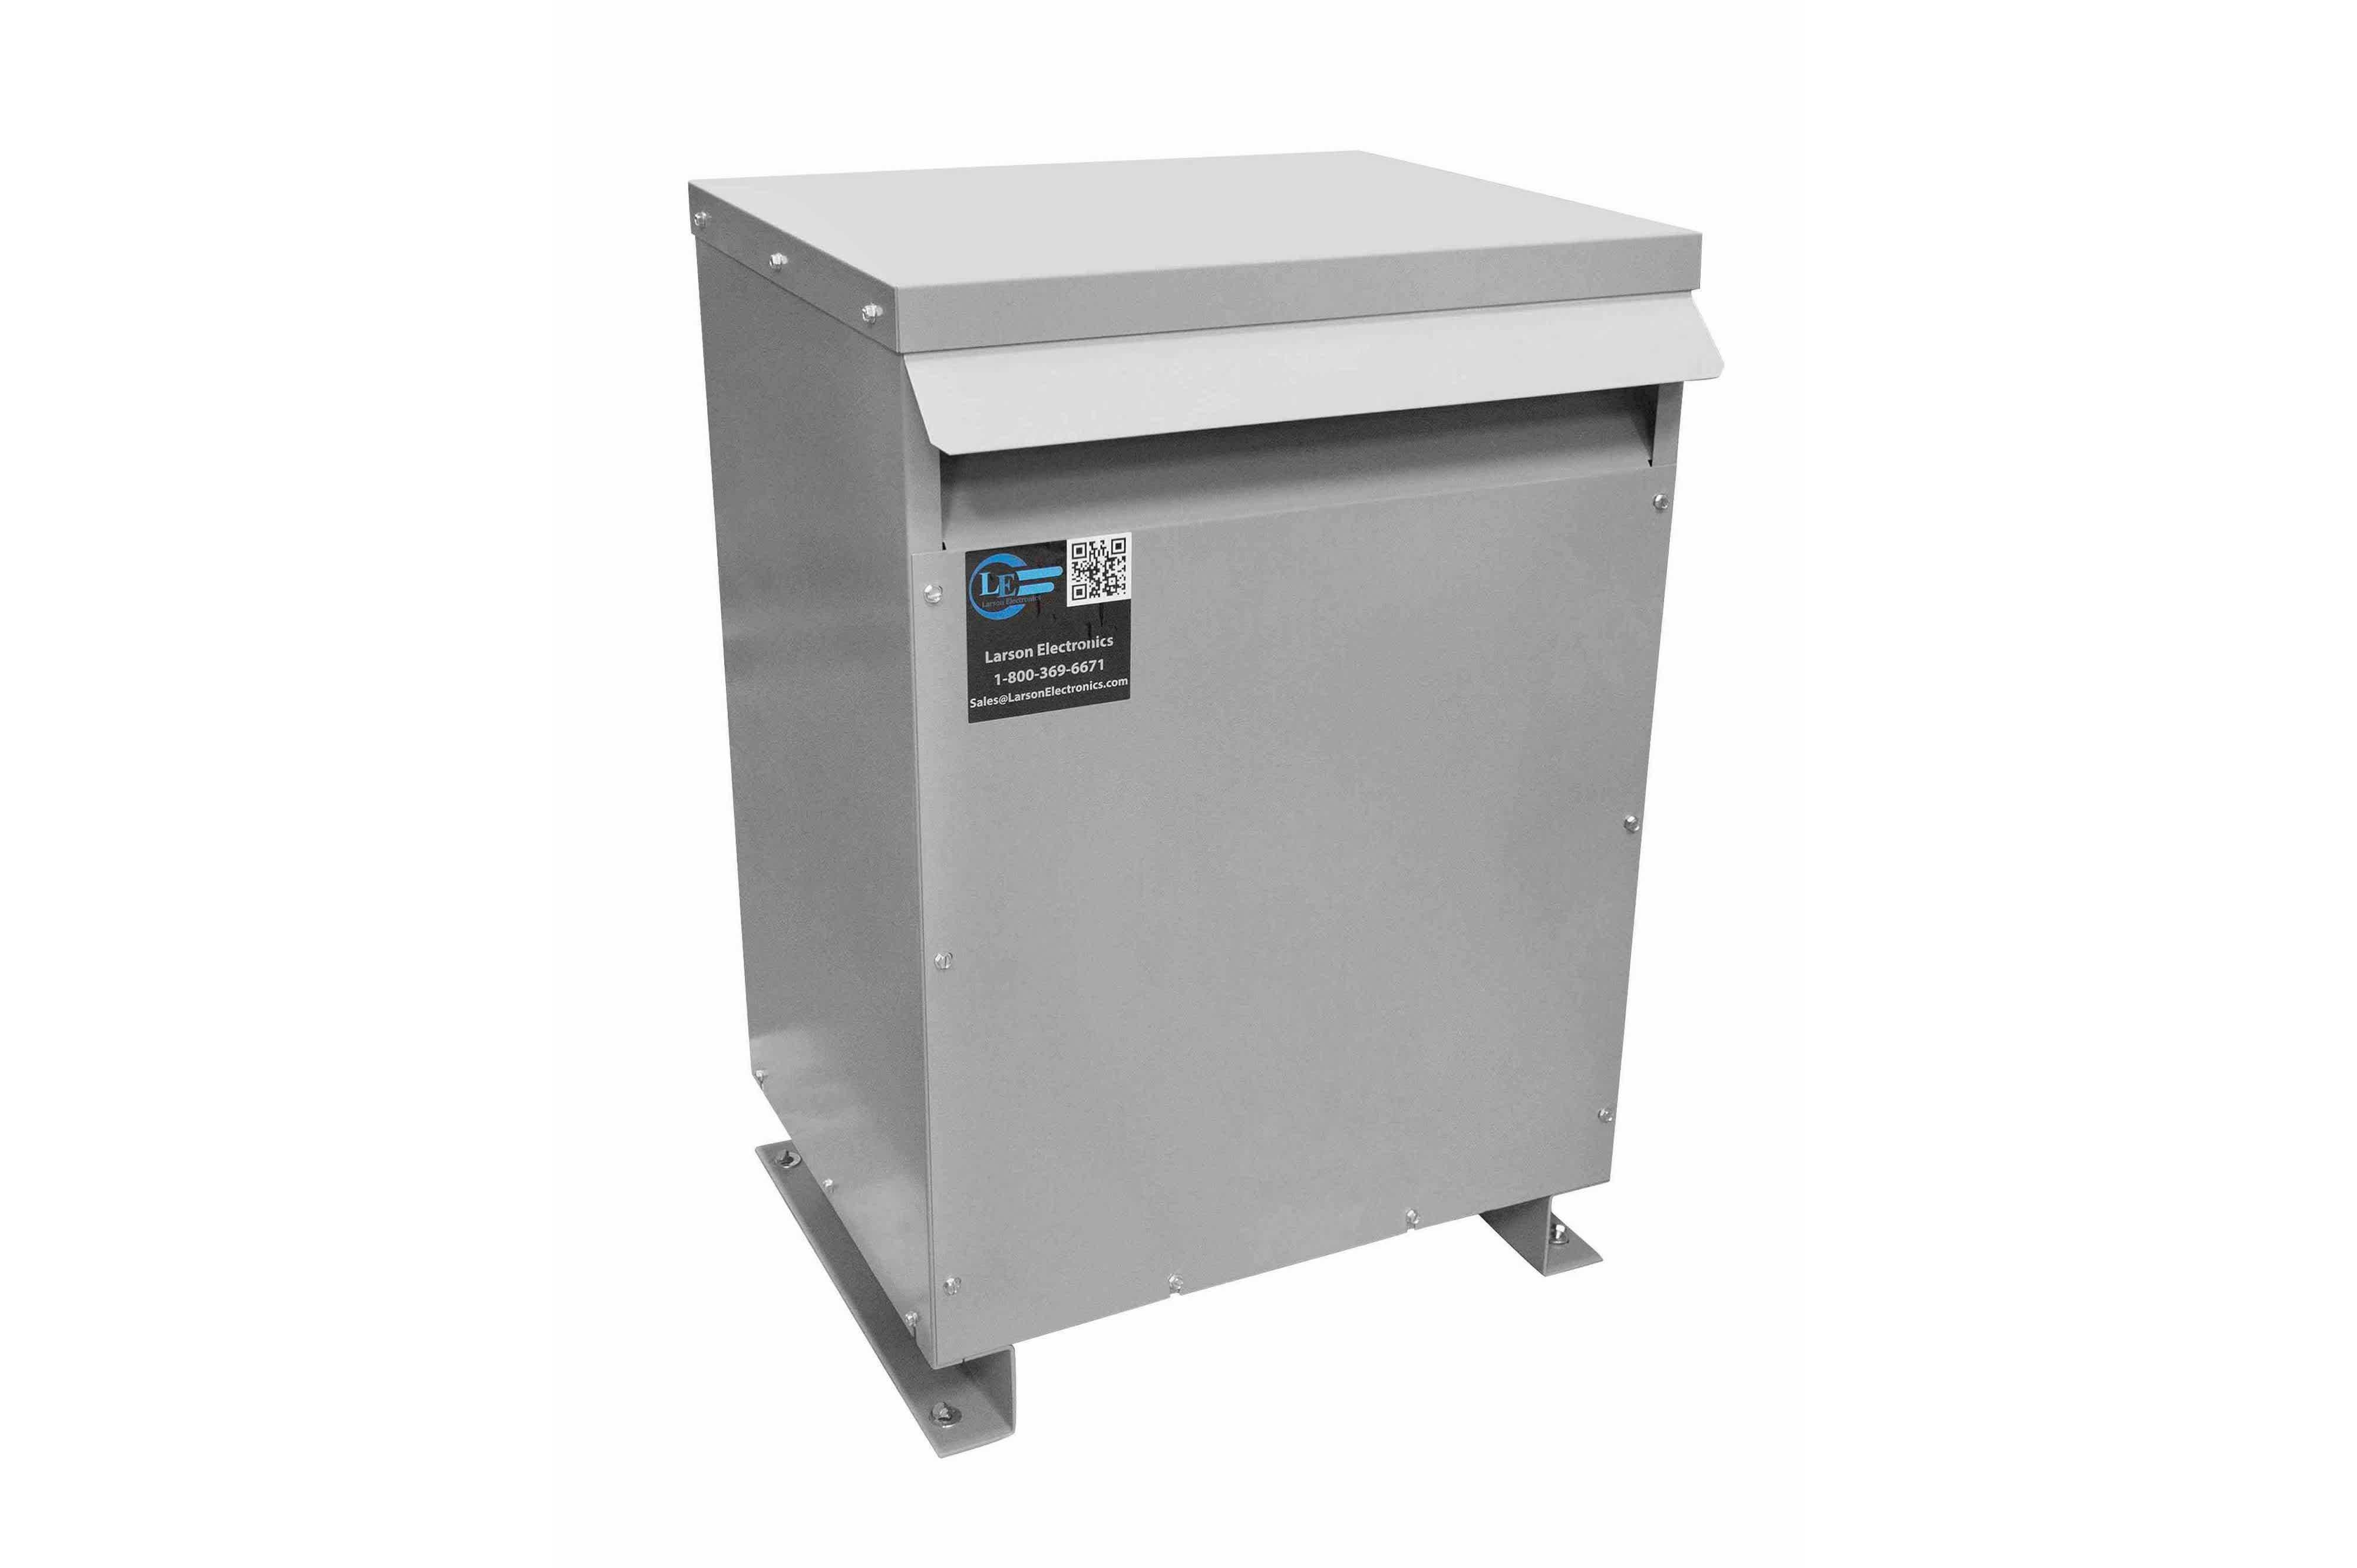 70 kVA 3PH Isolation Transformer, 220V Wye Primary, 208Y/120 Wye-N Secondary, N3R, Ventilated, 60 Hz